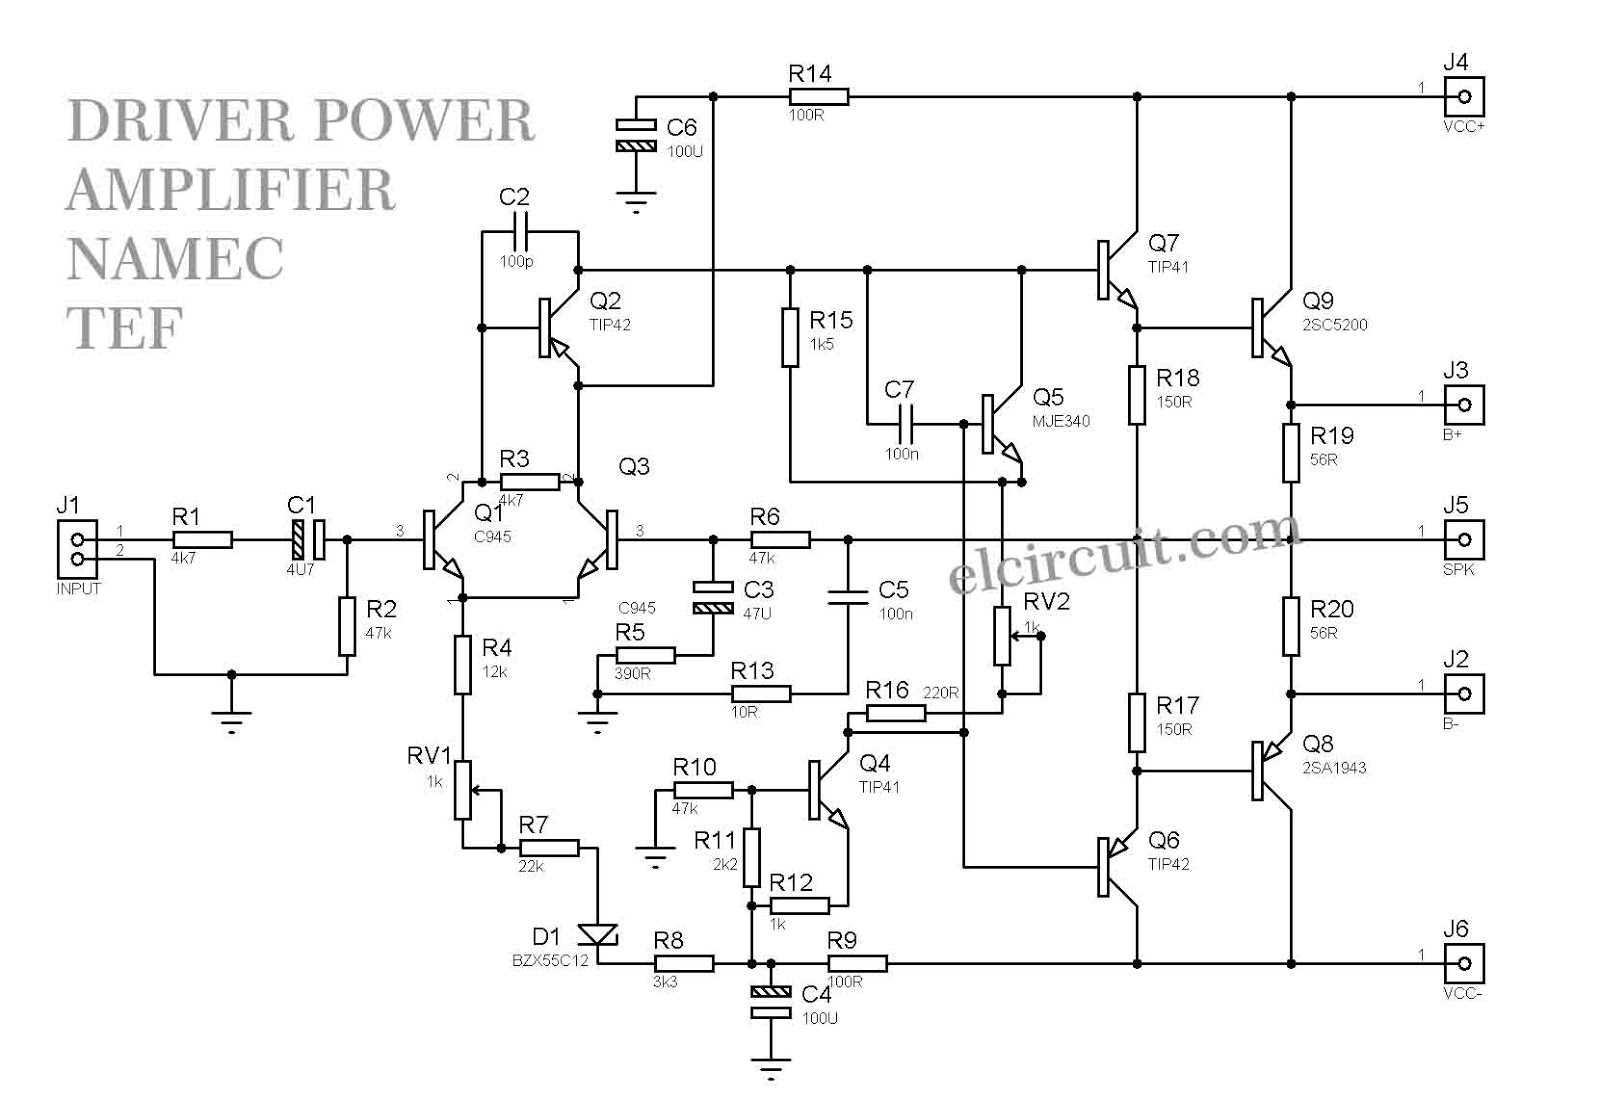 hight resolution of circuit diagram schematic driver power amplifier namec tef